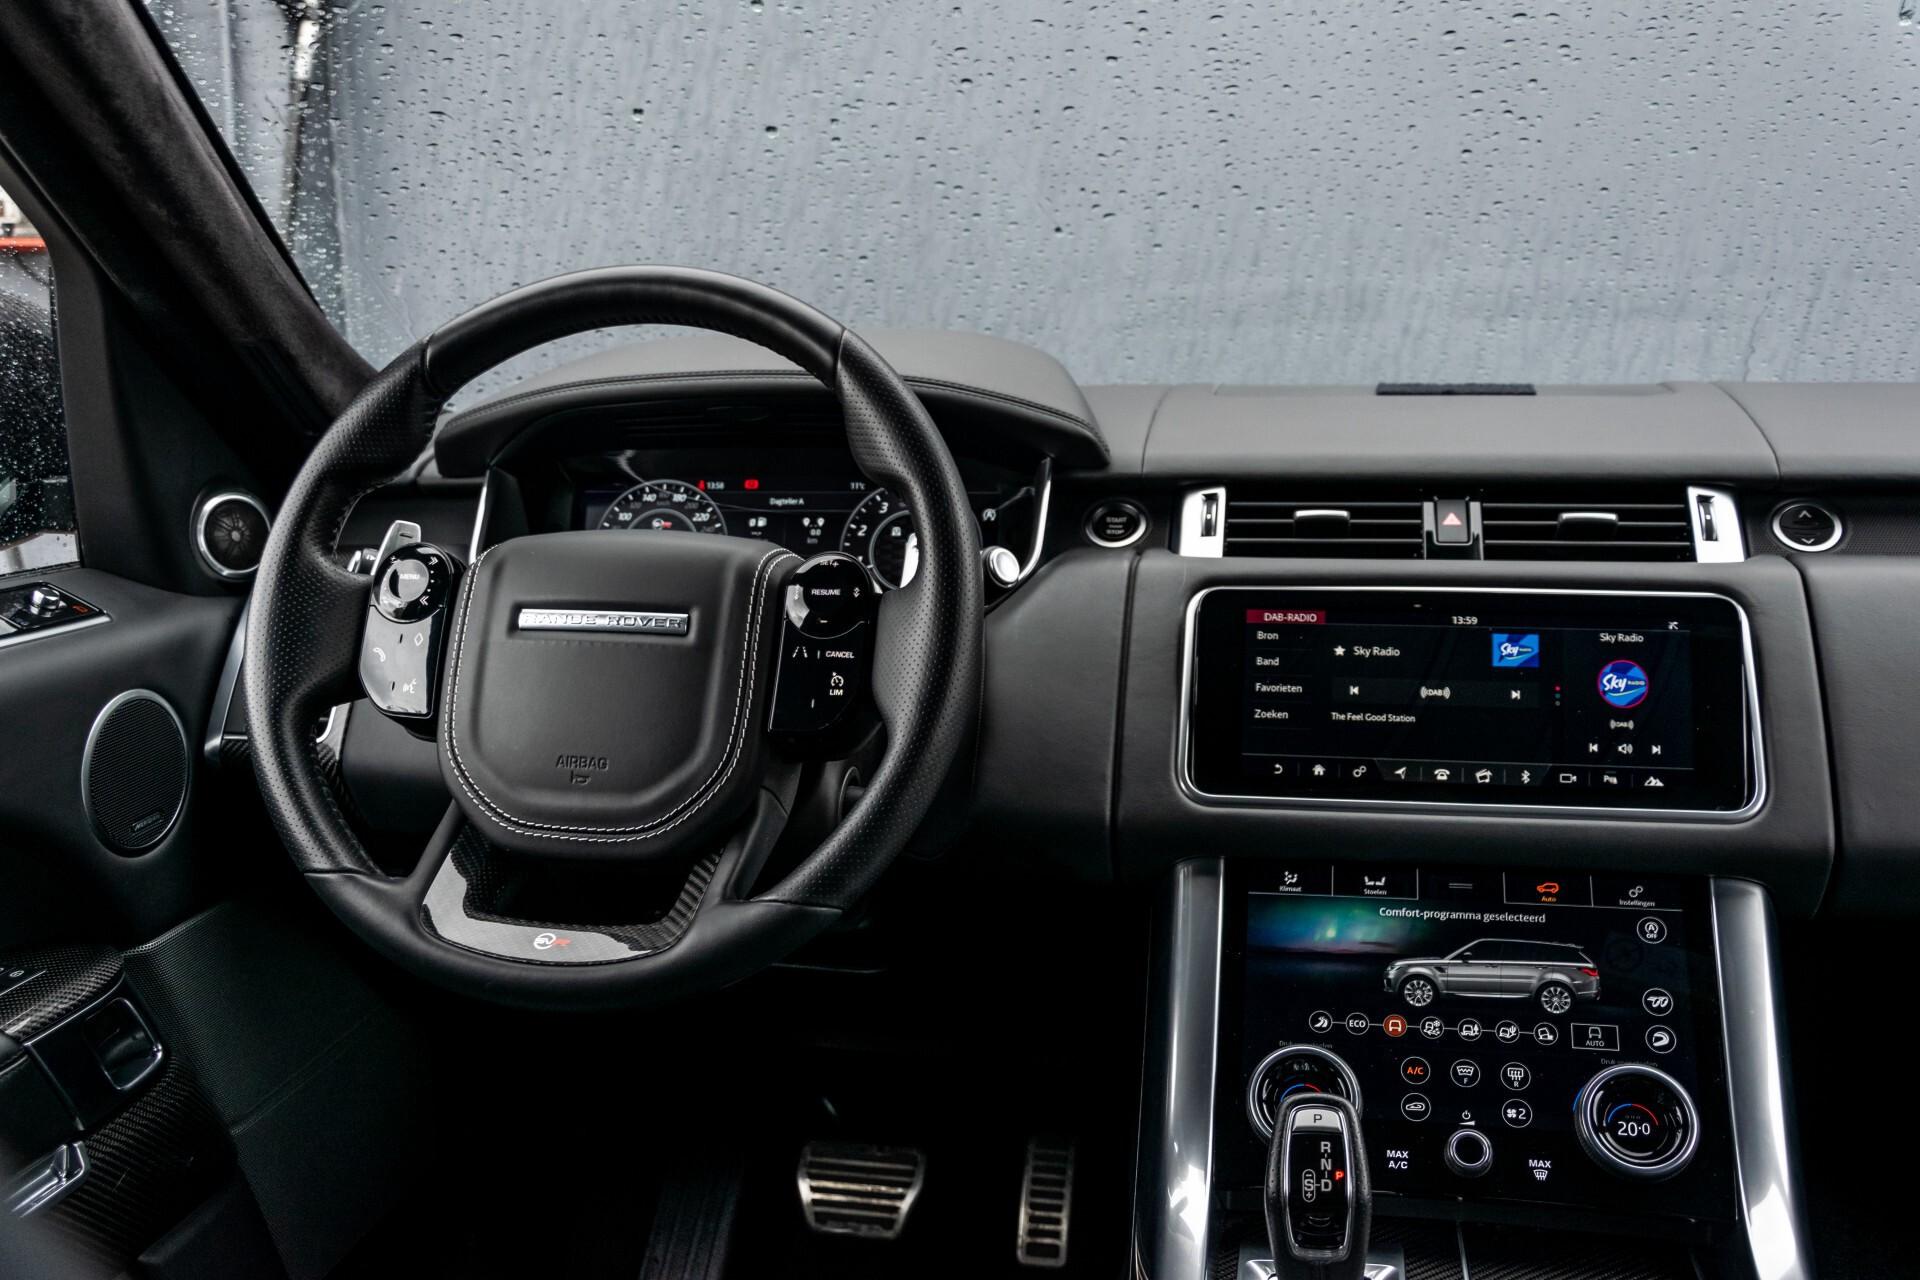 Land Rover Range Rover Sport SVR 5.0 Supercharged 575pk Full Carbon Nieuwprijs €241377 Foto 6